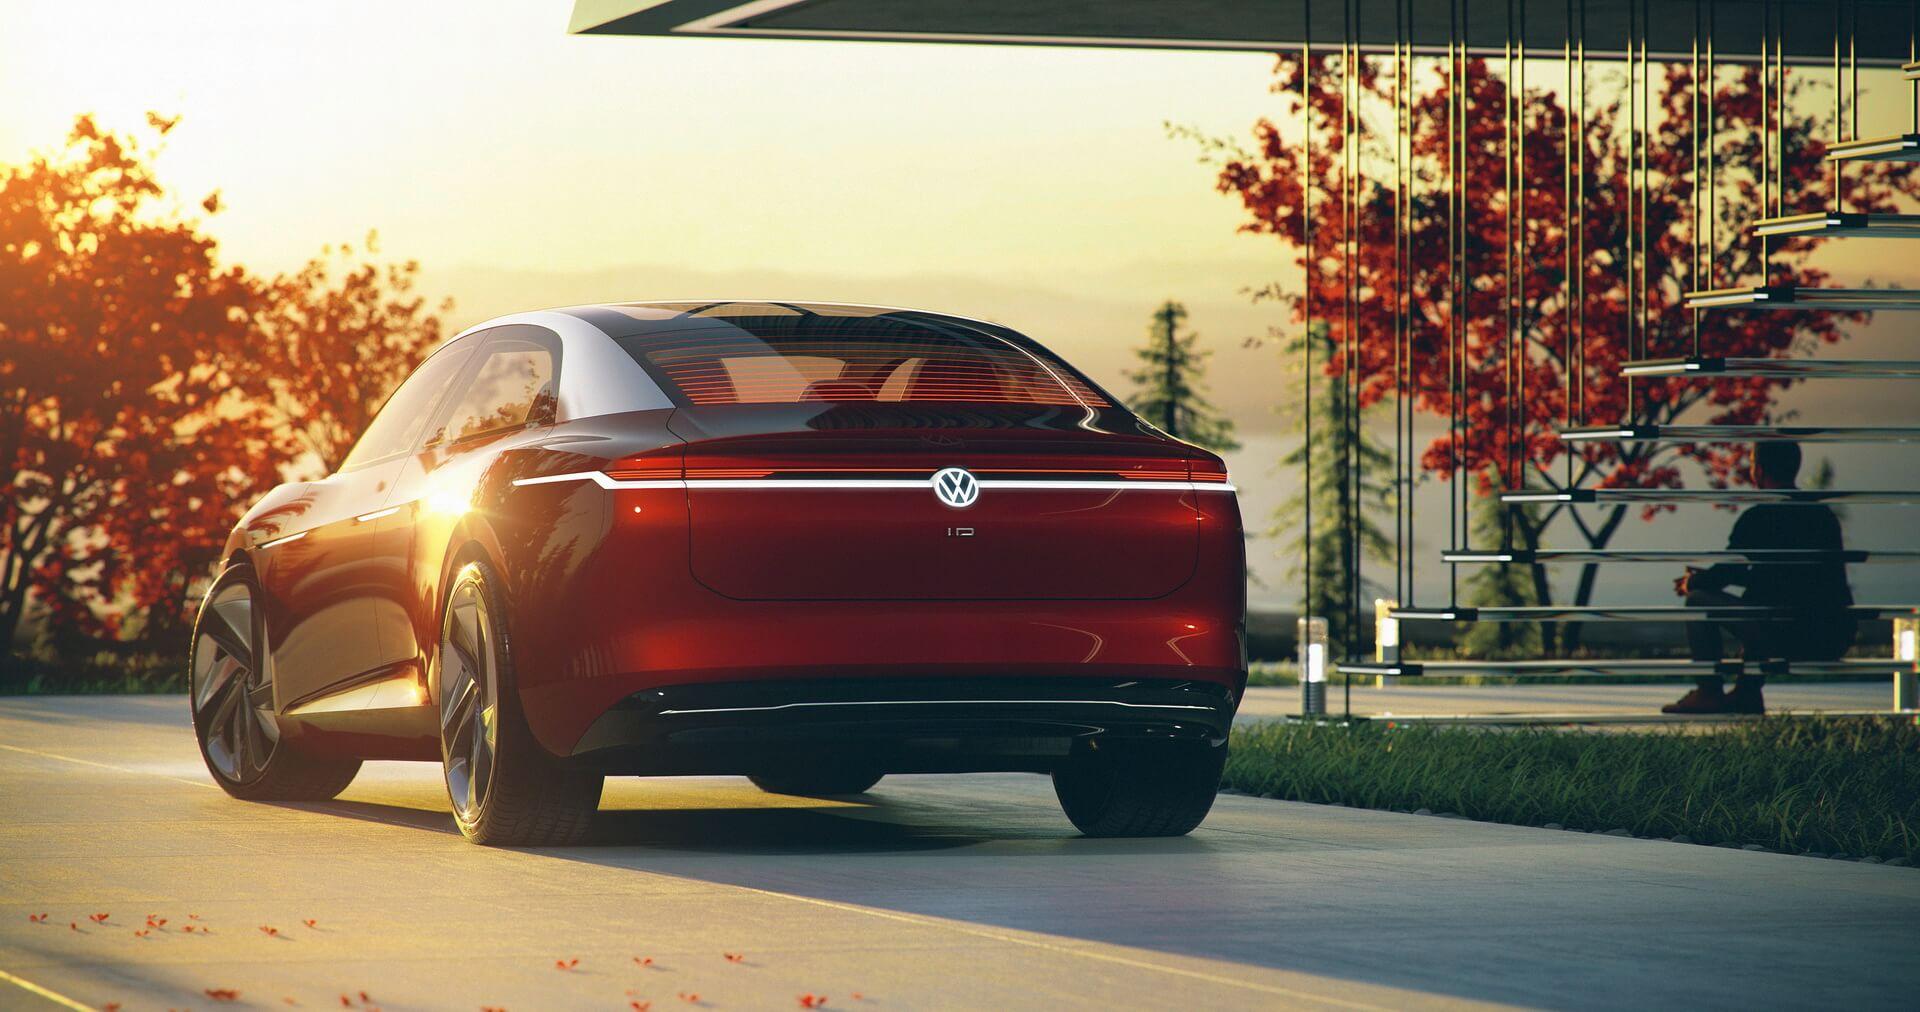 Концепт электромобиля Volkswagen I.D. VIZZION